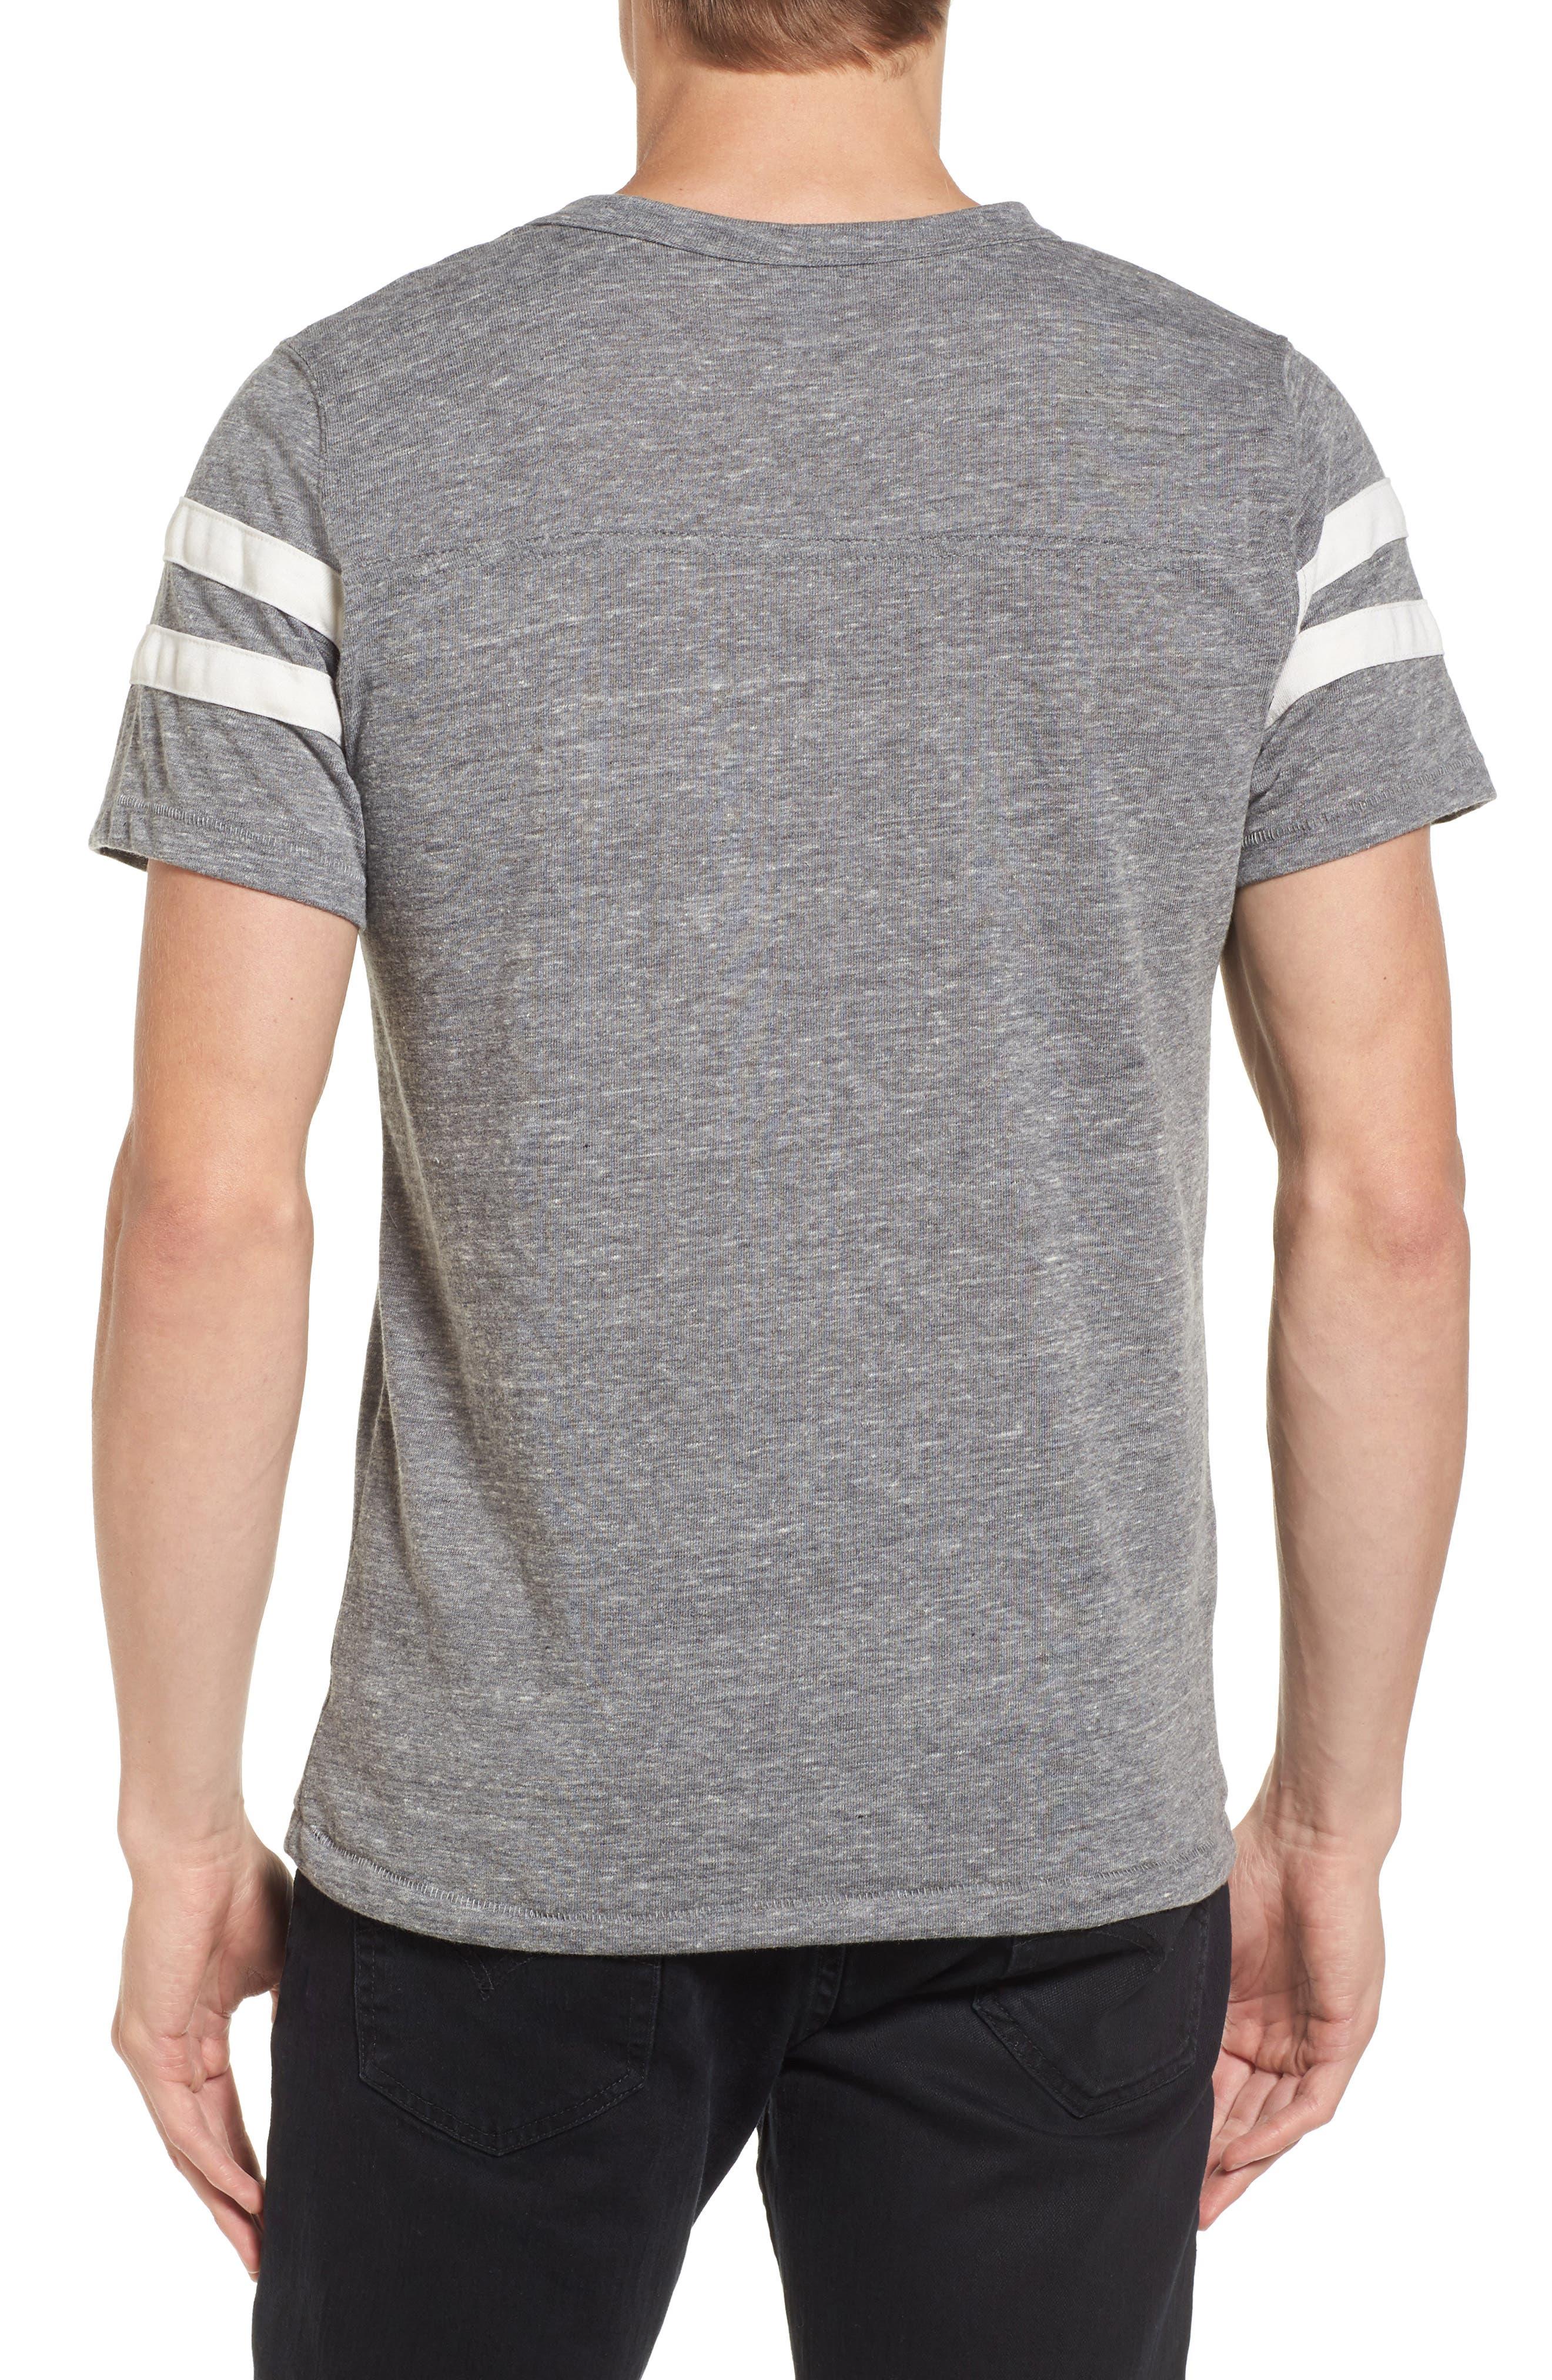 Football T-Shirt,                             Alternate thumbnail 2, color,                             Eco Grey/ Eco Ivory